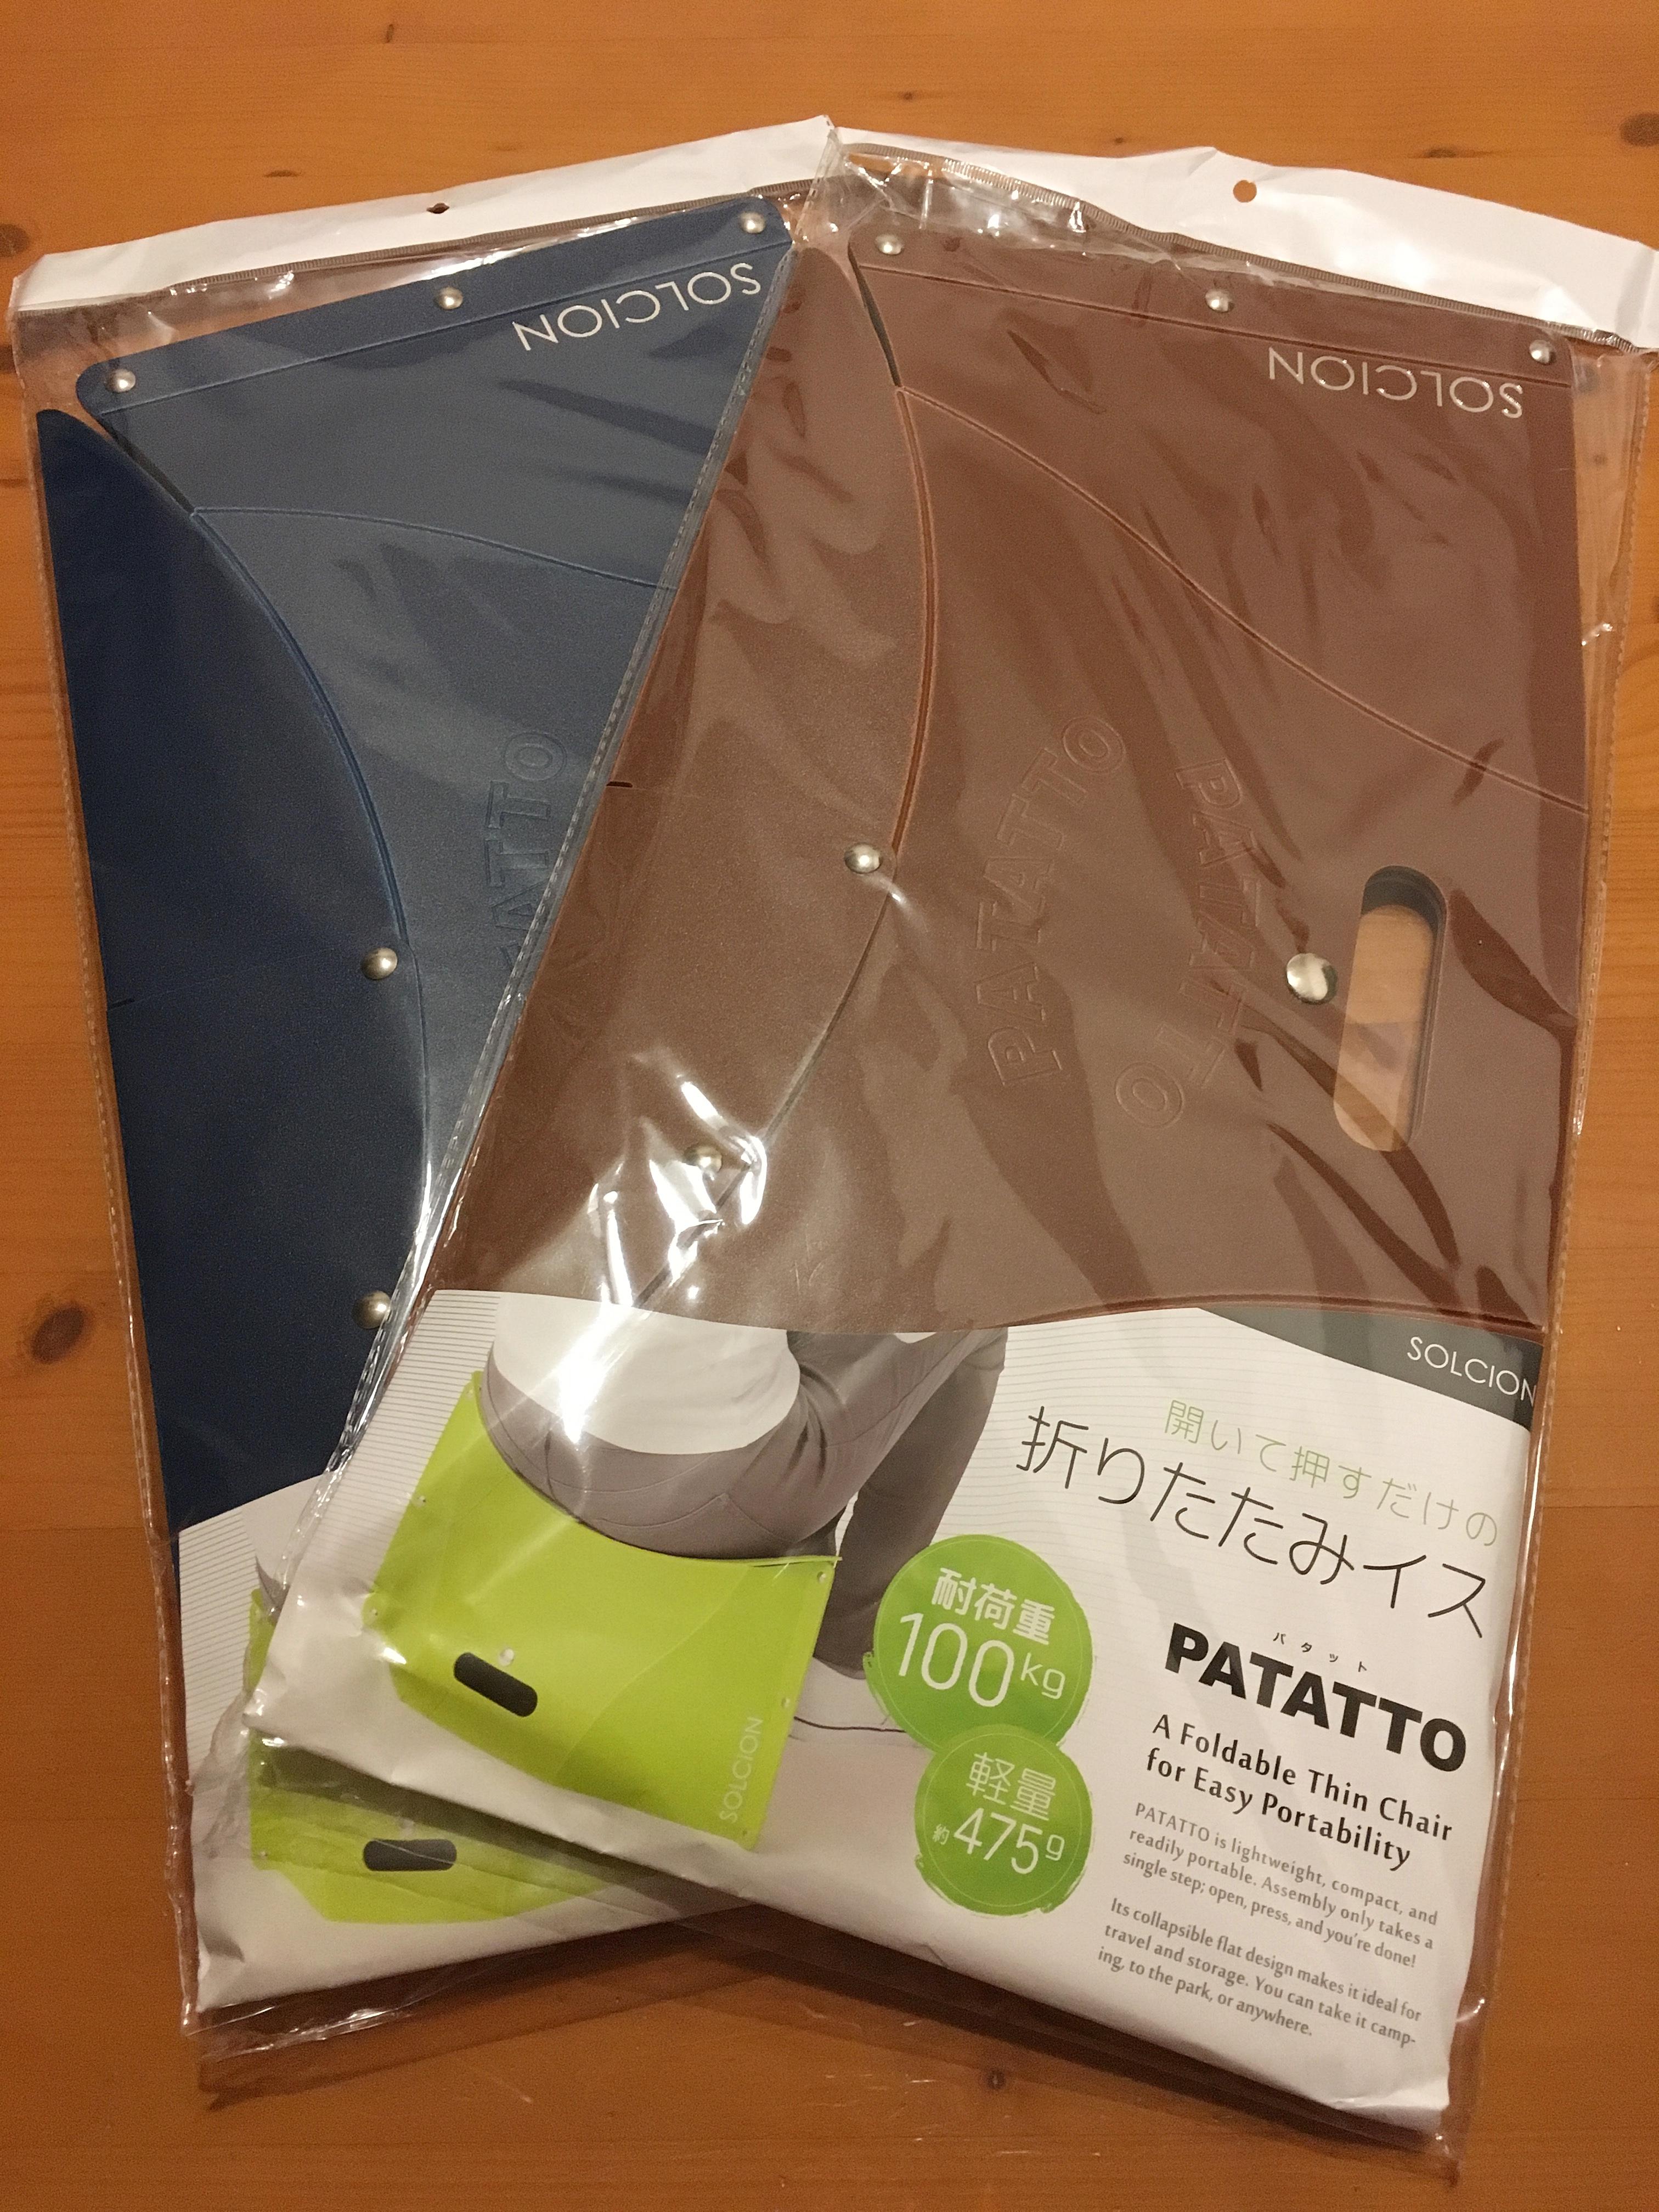 PATATTO パッケージ.JPG